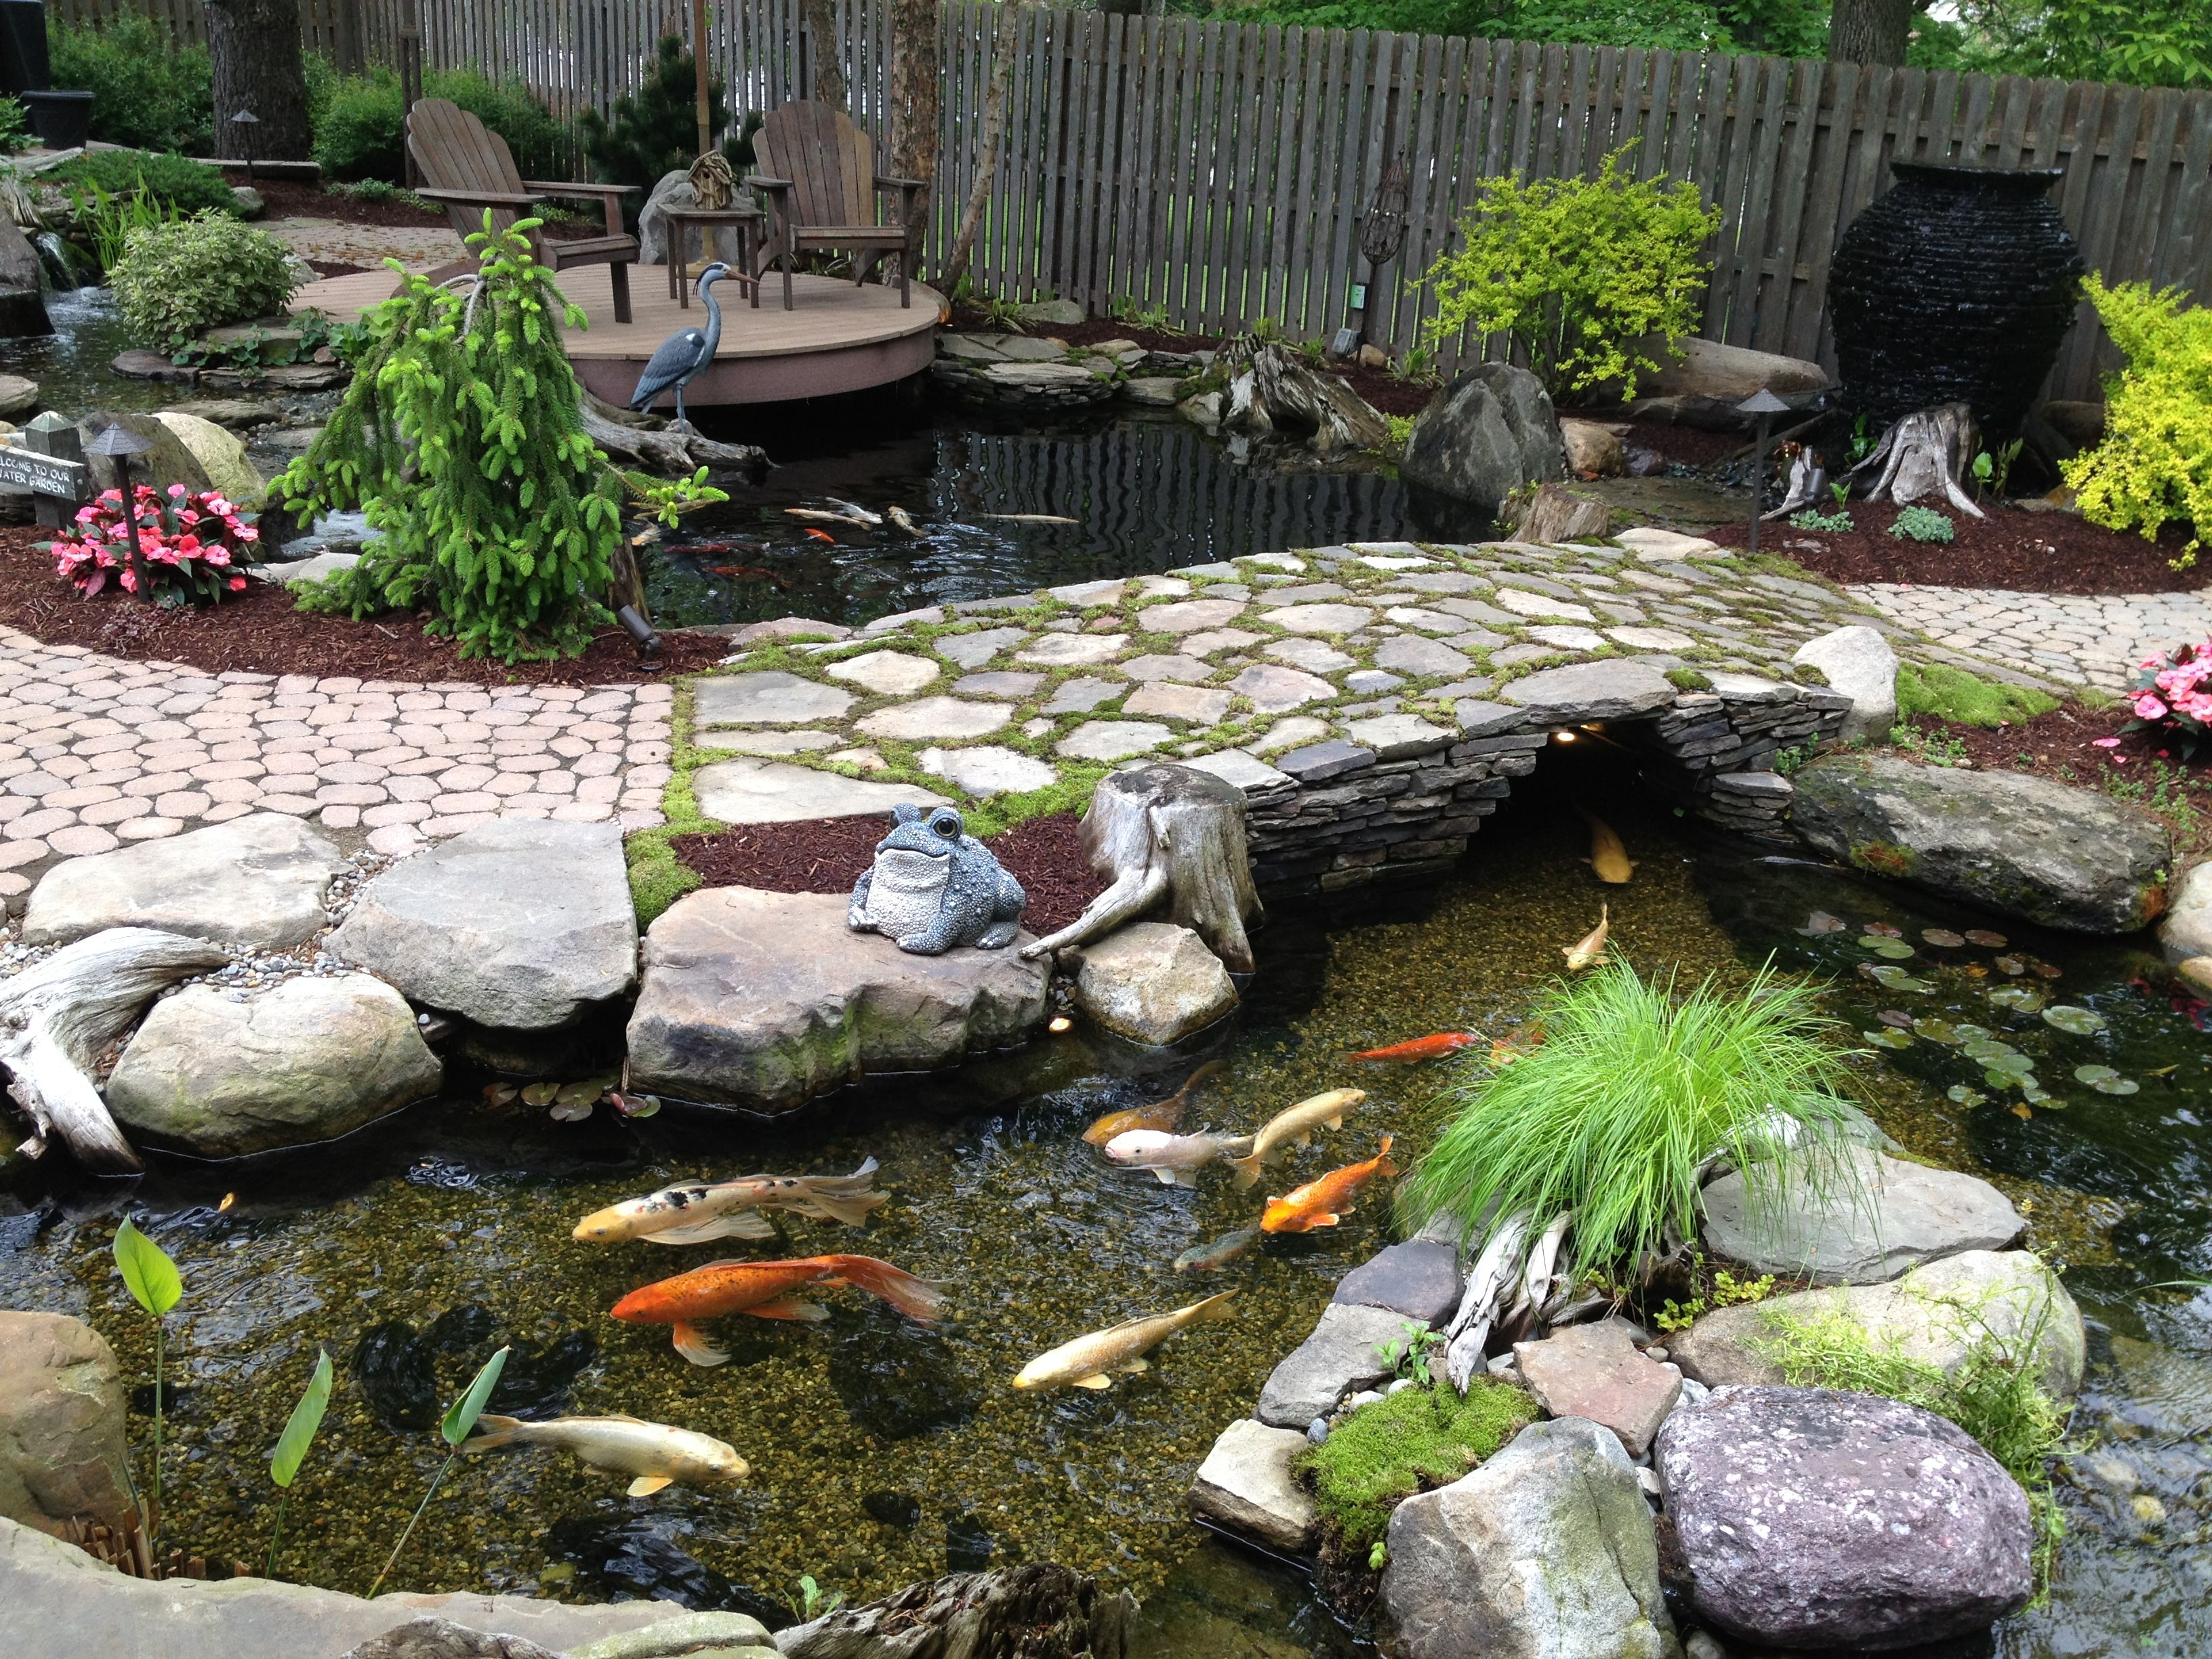 Poisson Rouge Bassin Extérieur secrets to a crystal clear pond, trouble free pond